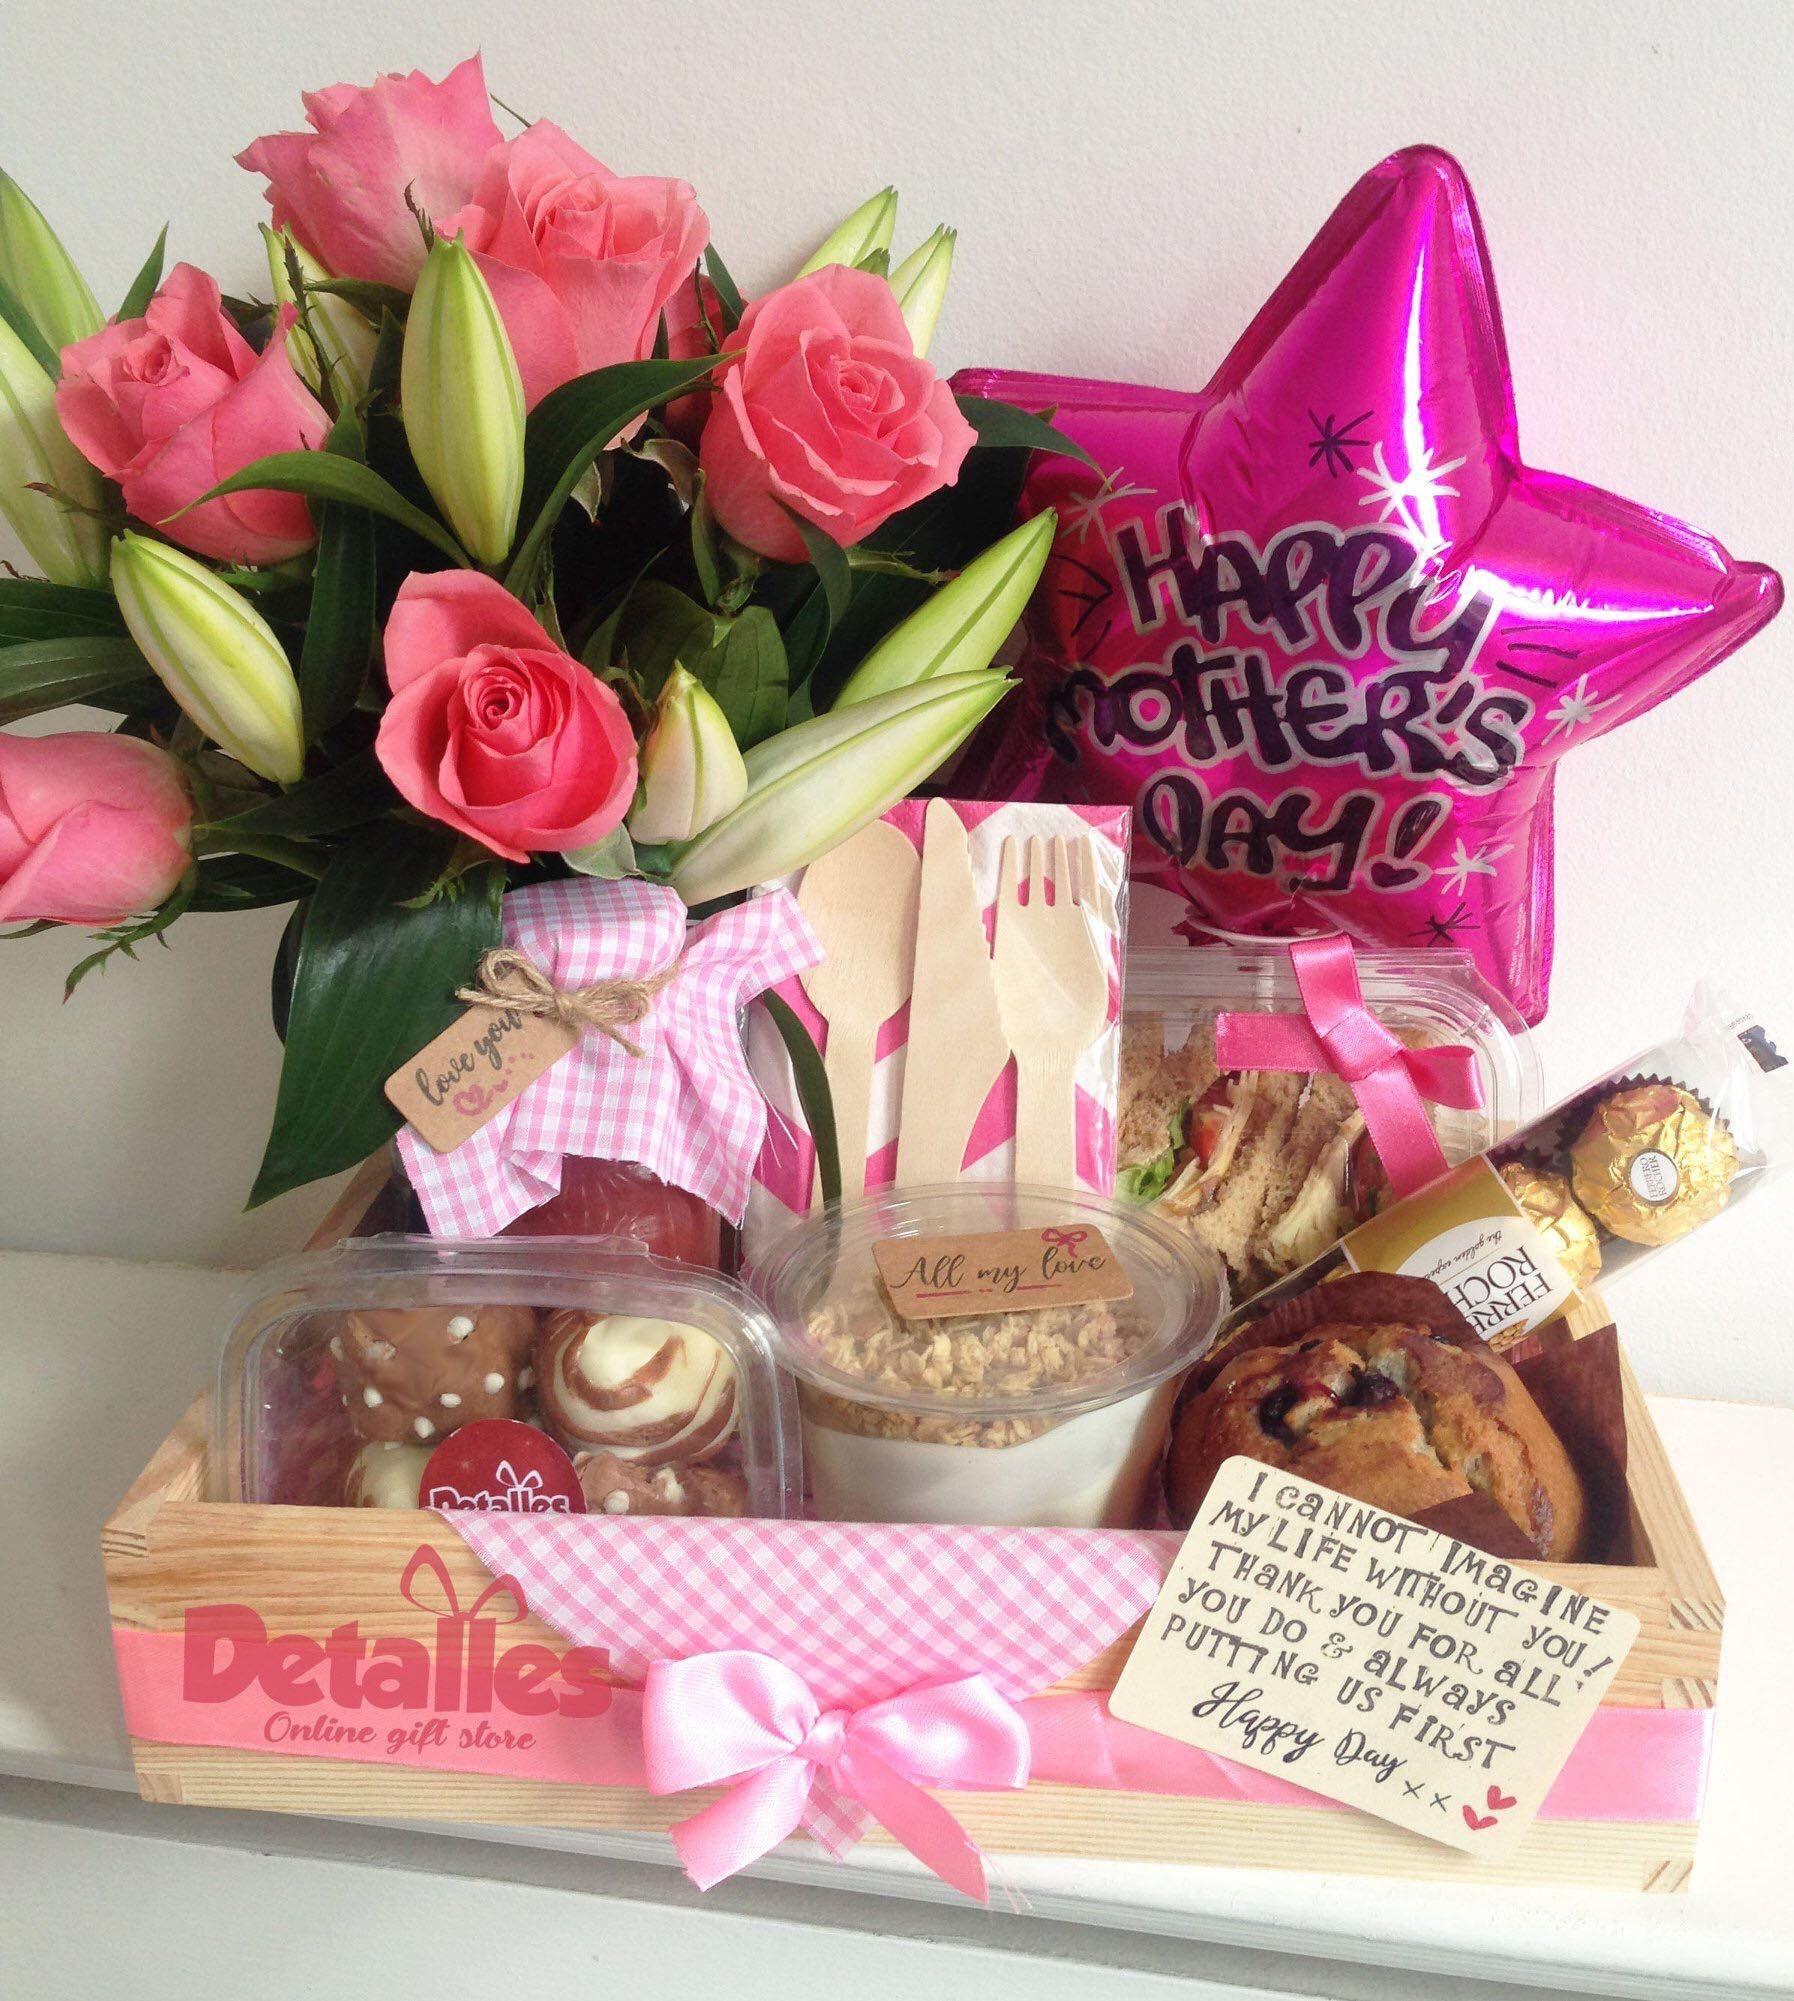 Surprise Deliveries Desayunos Sorpresa Gifts London Breakfast Gift Detalles